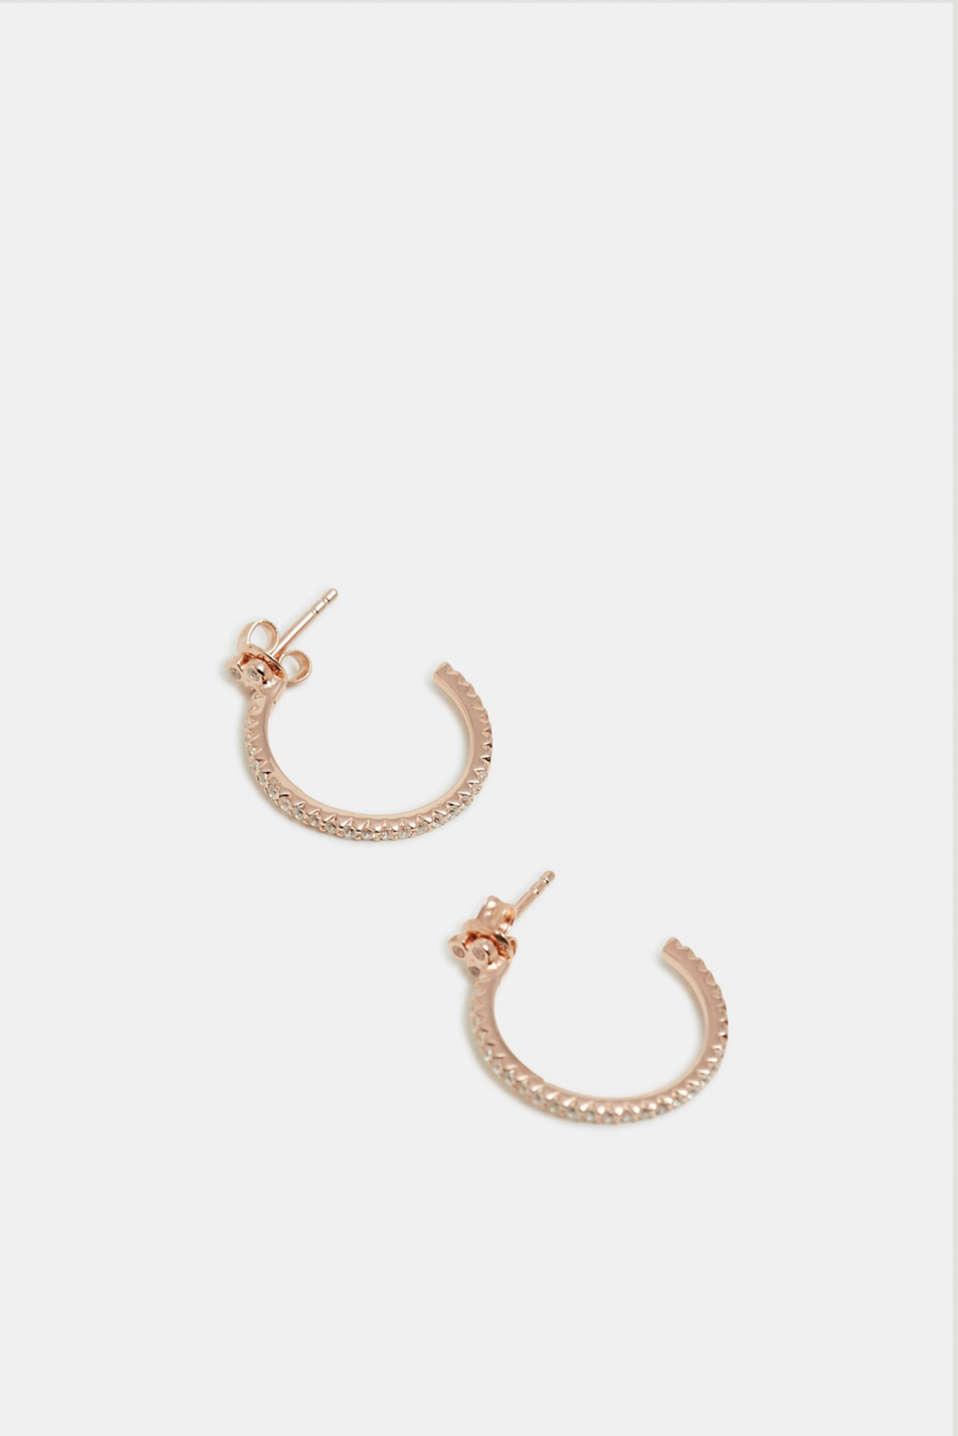 Hoop earrings with zirconia, sterling silver, ROSEGOLD, detail image number 0